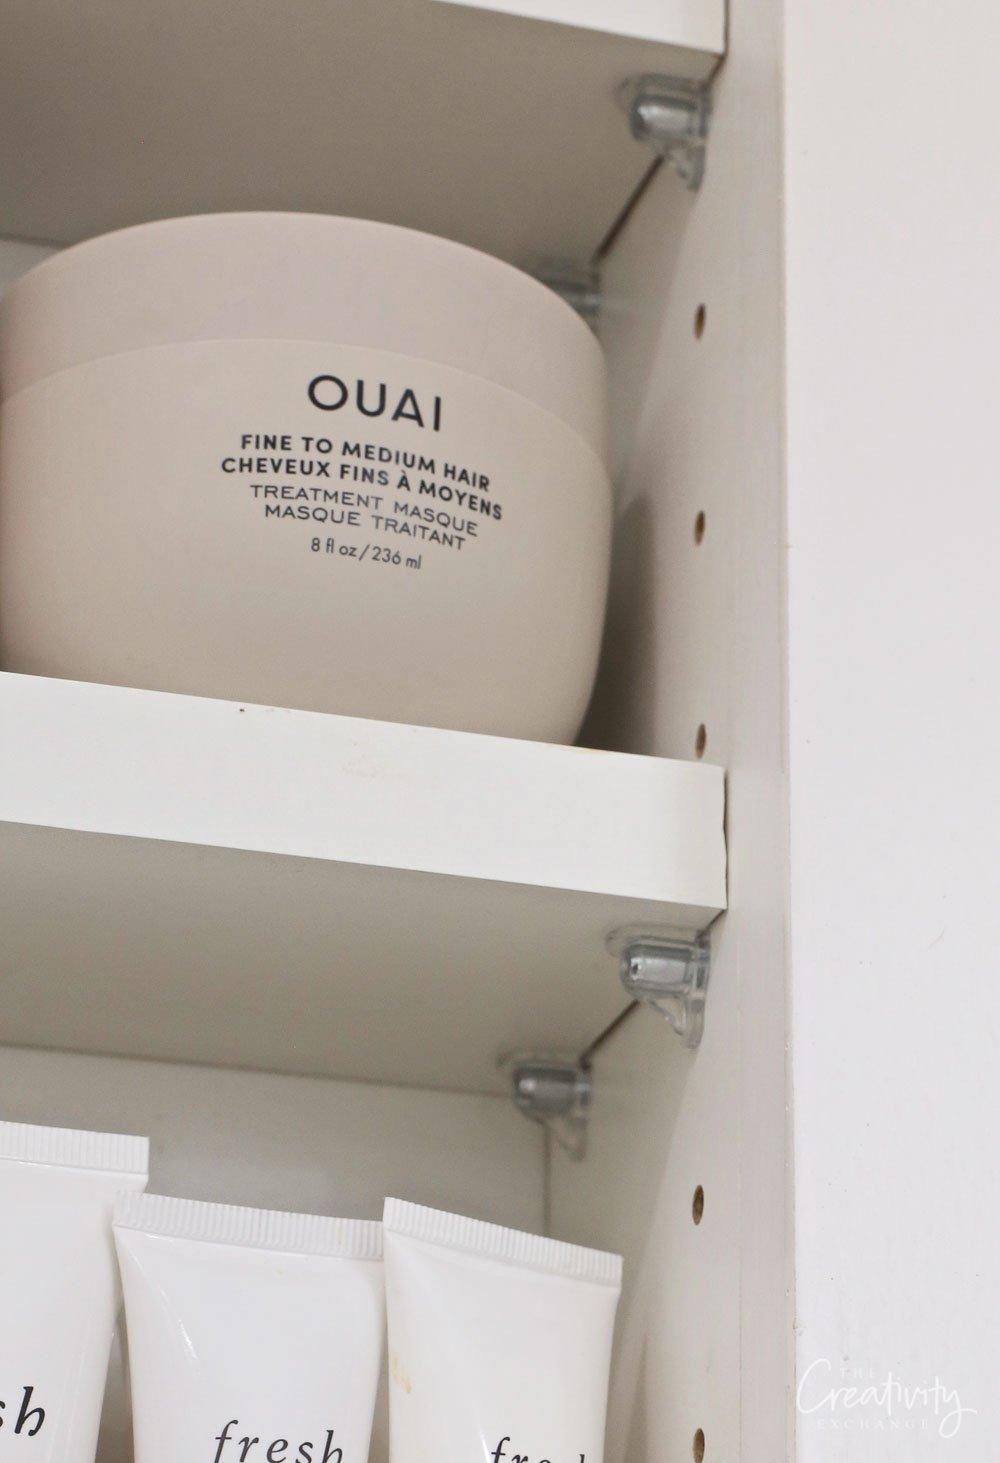 Between the stud adjustable bathroom storage